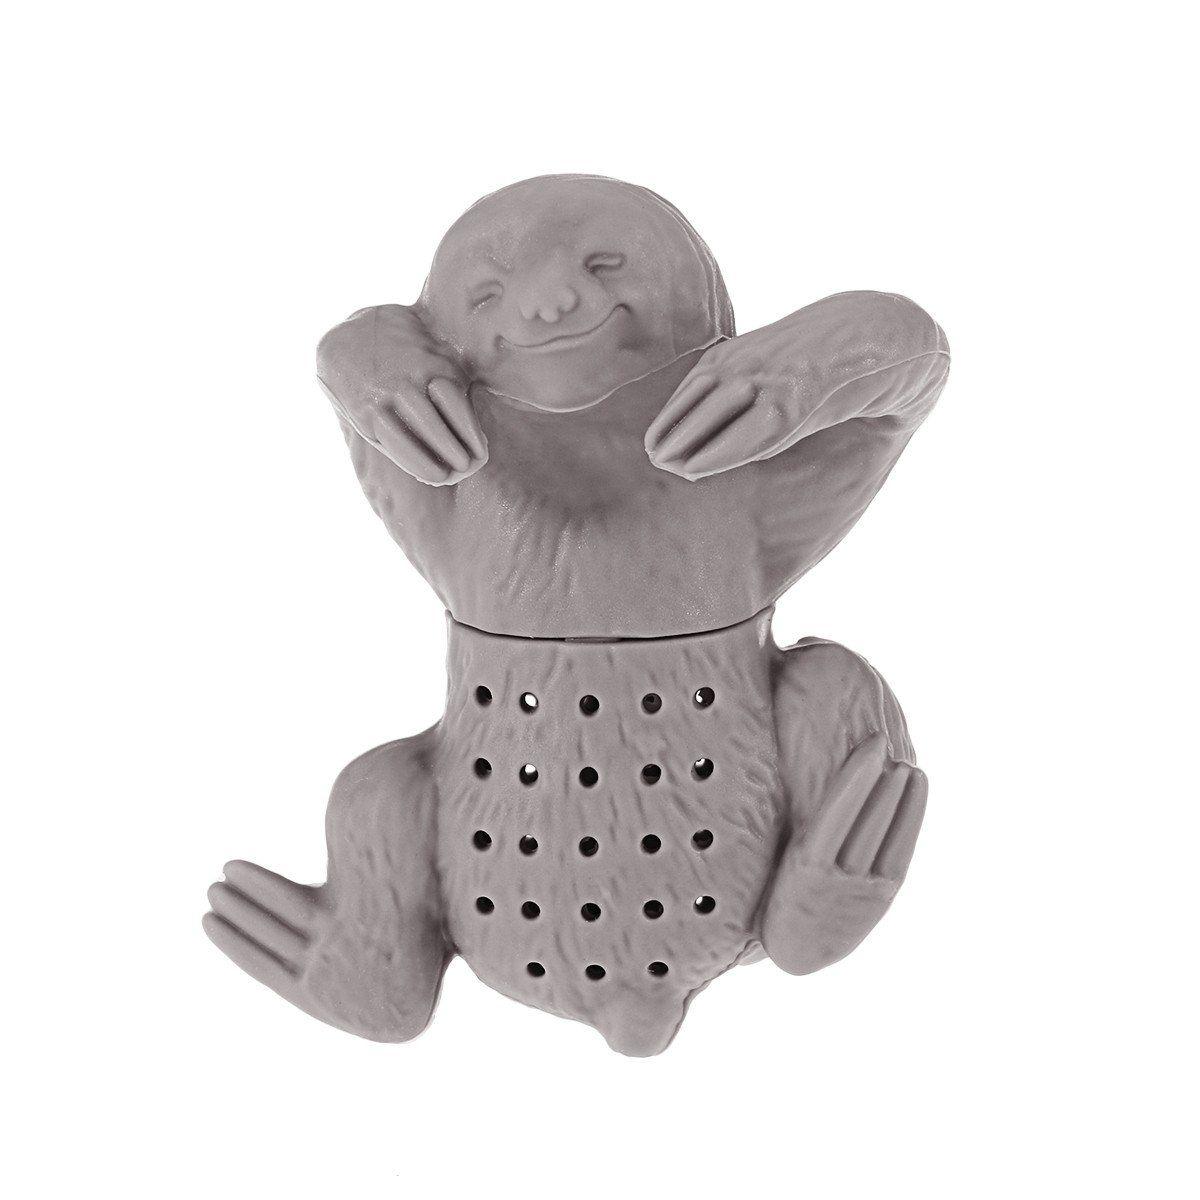 Silicone Sloth Tea Infuser Creative Tea Bag Filter Strainer For